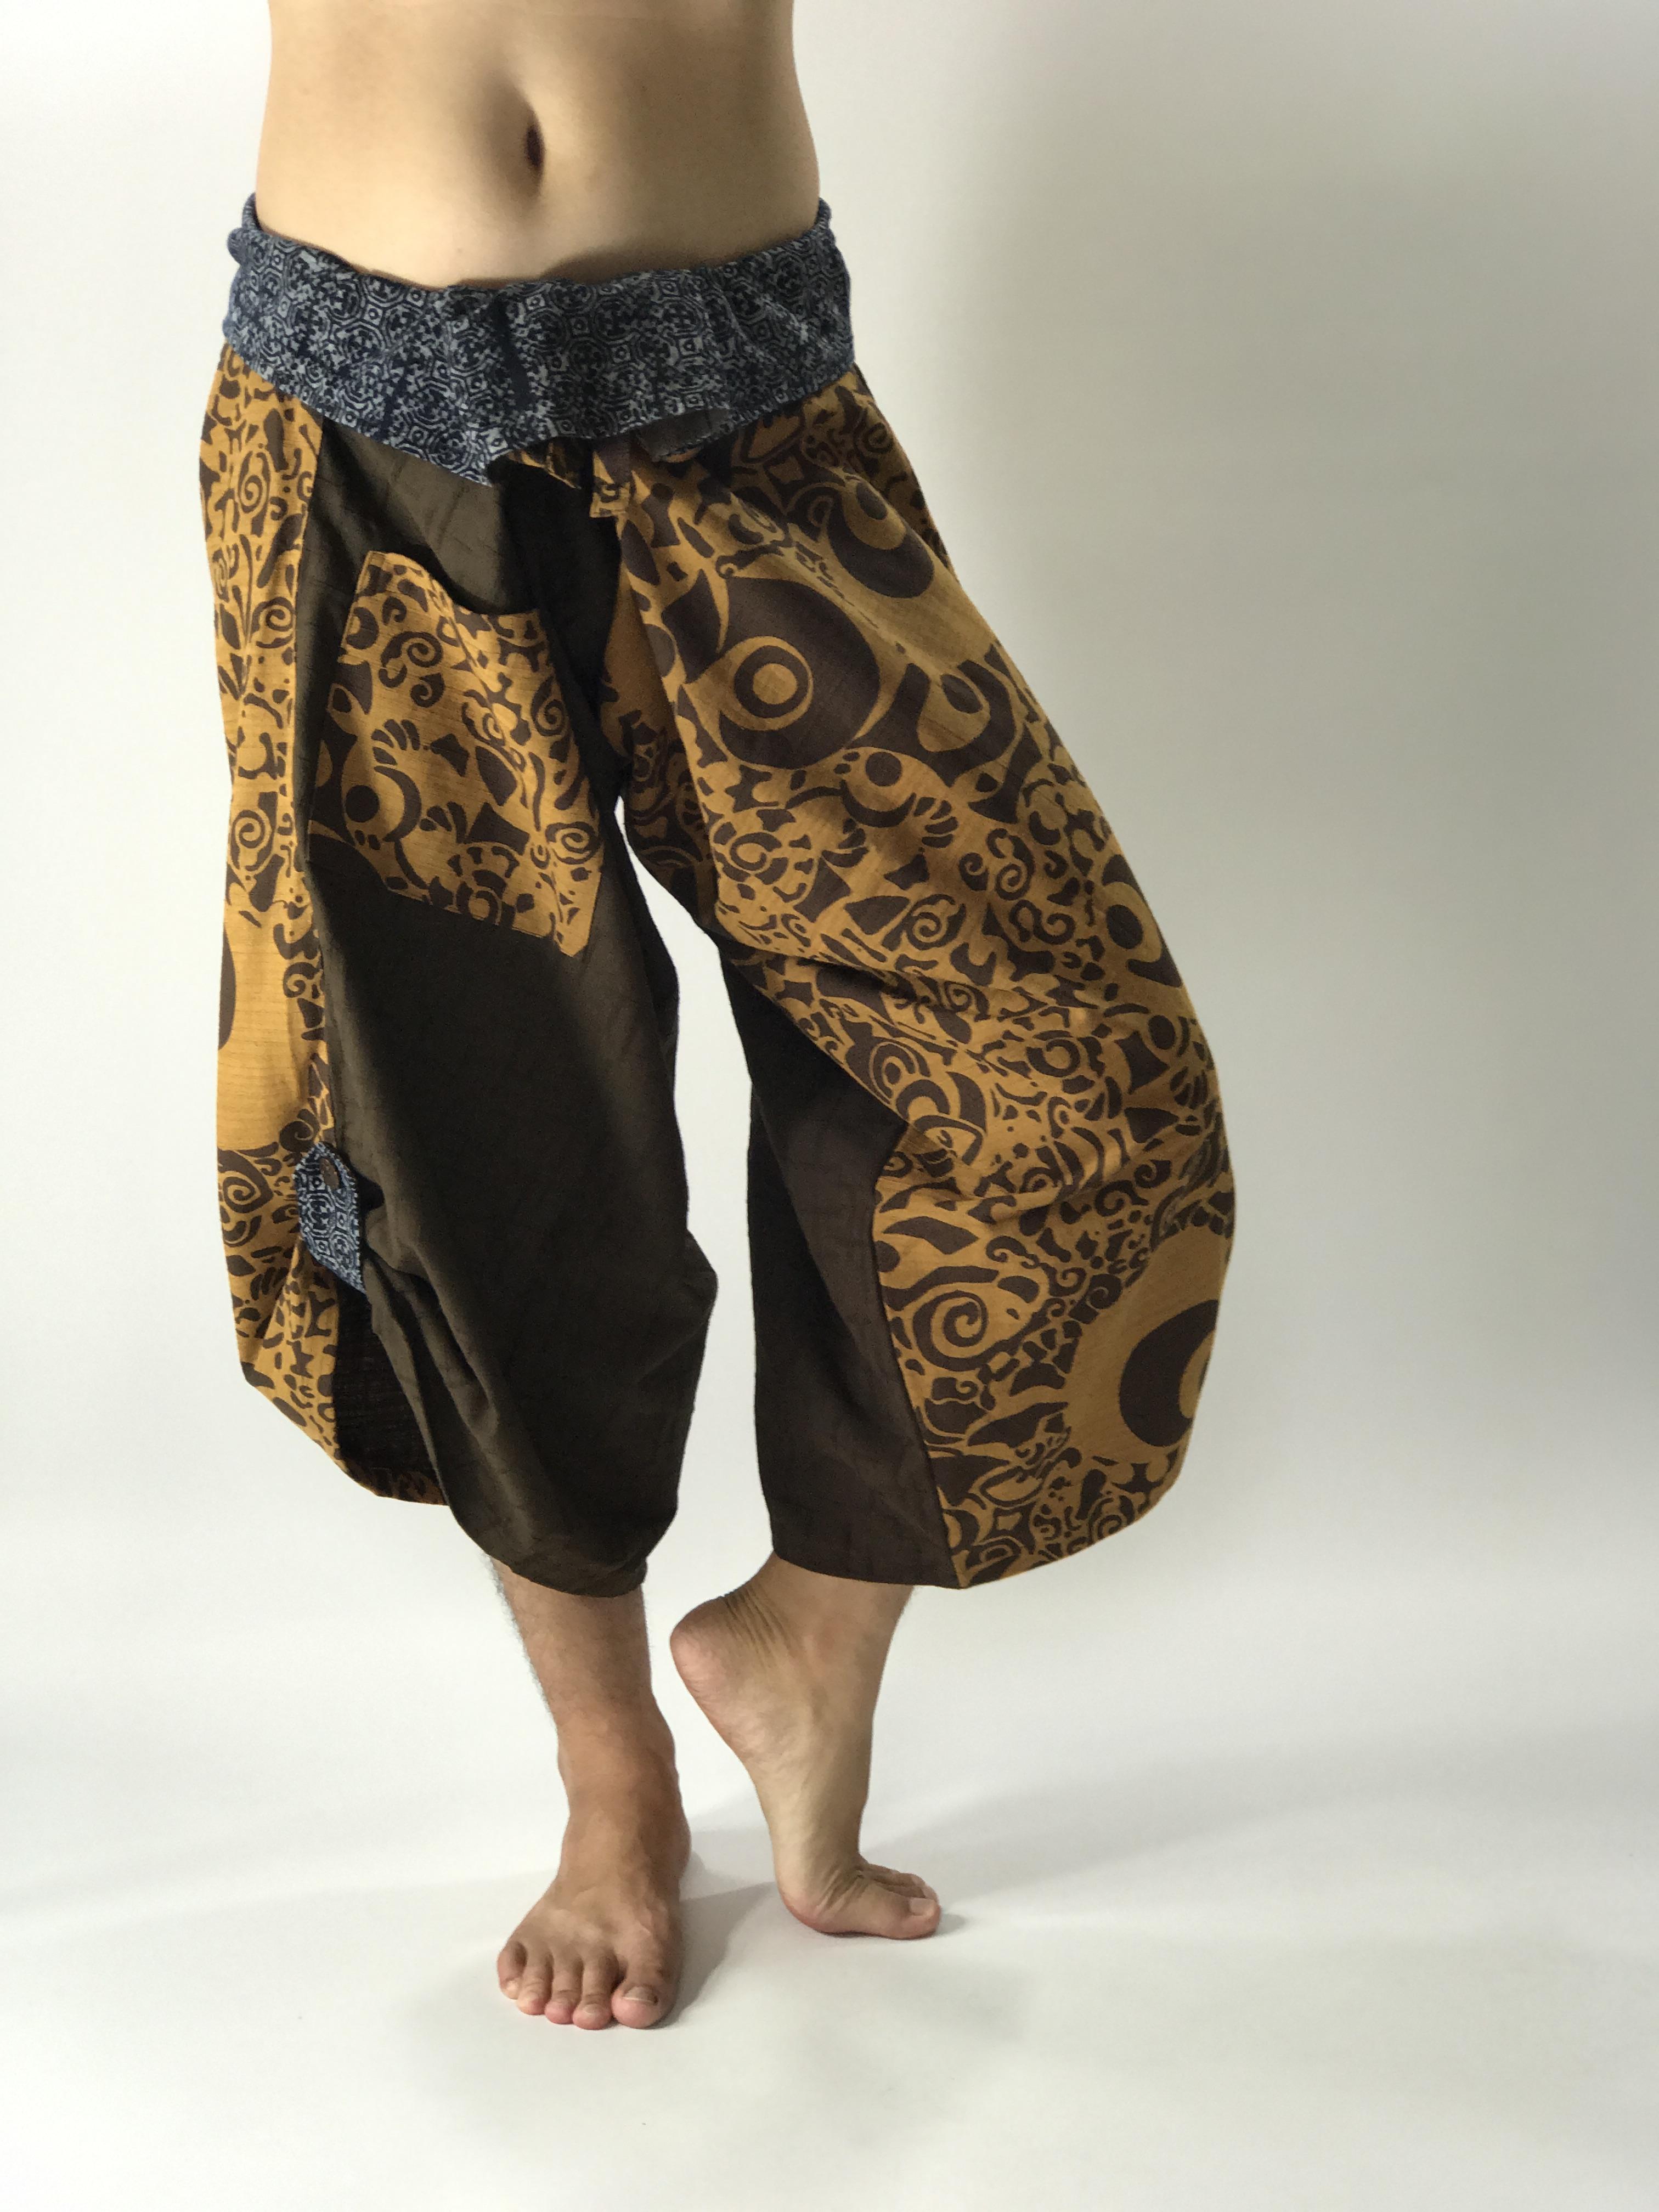 SR0452 Samurai Pants Harem pants have fisherman pants style wrap around waist